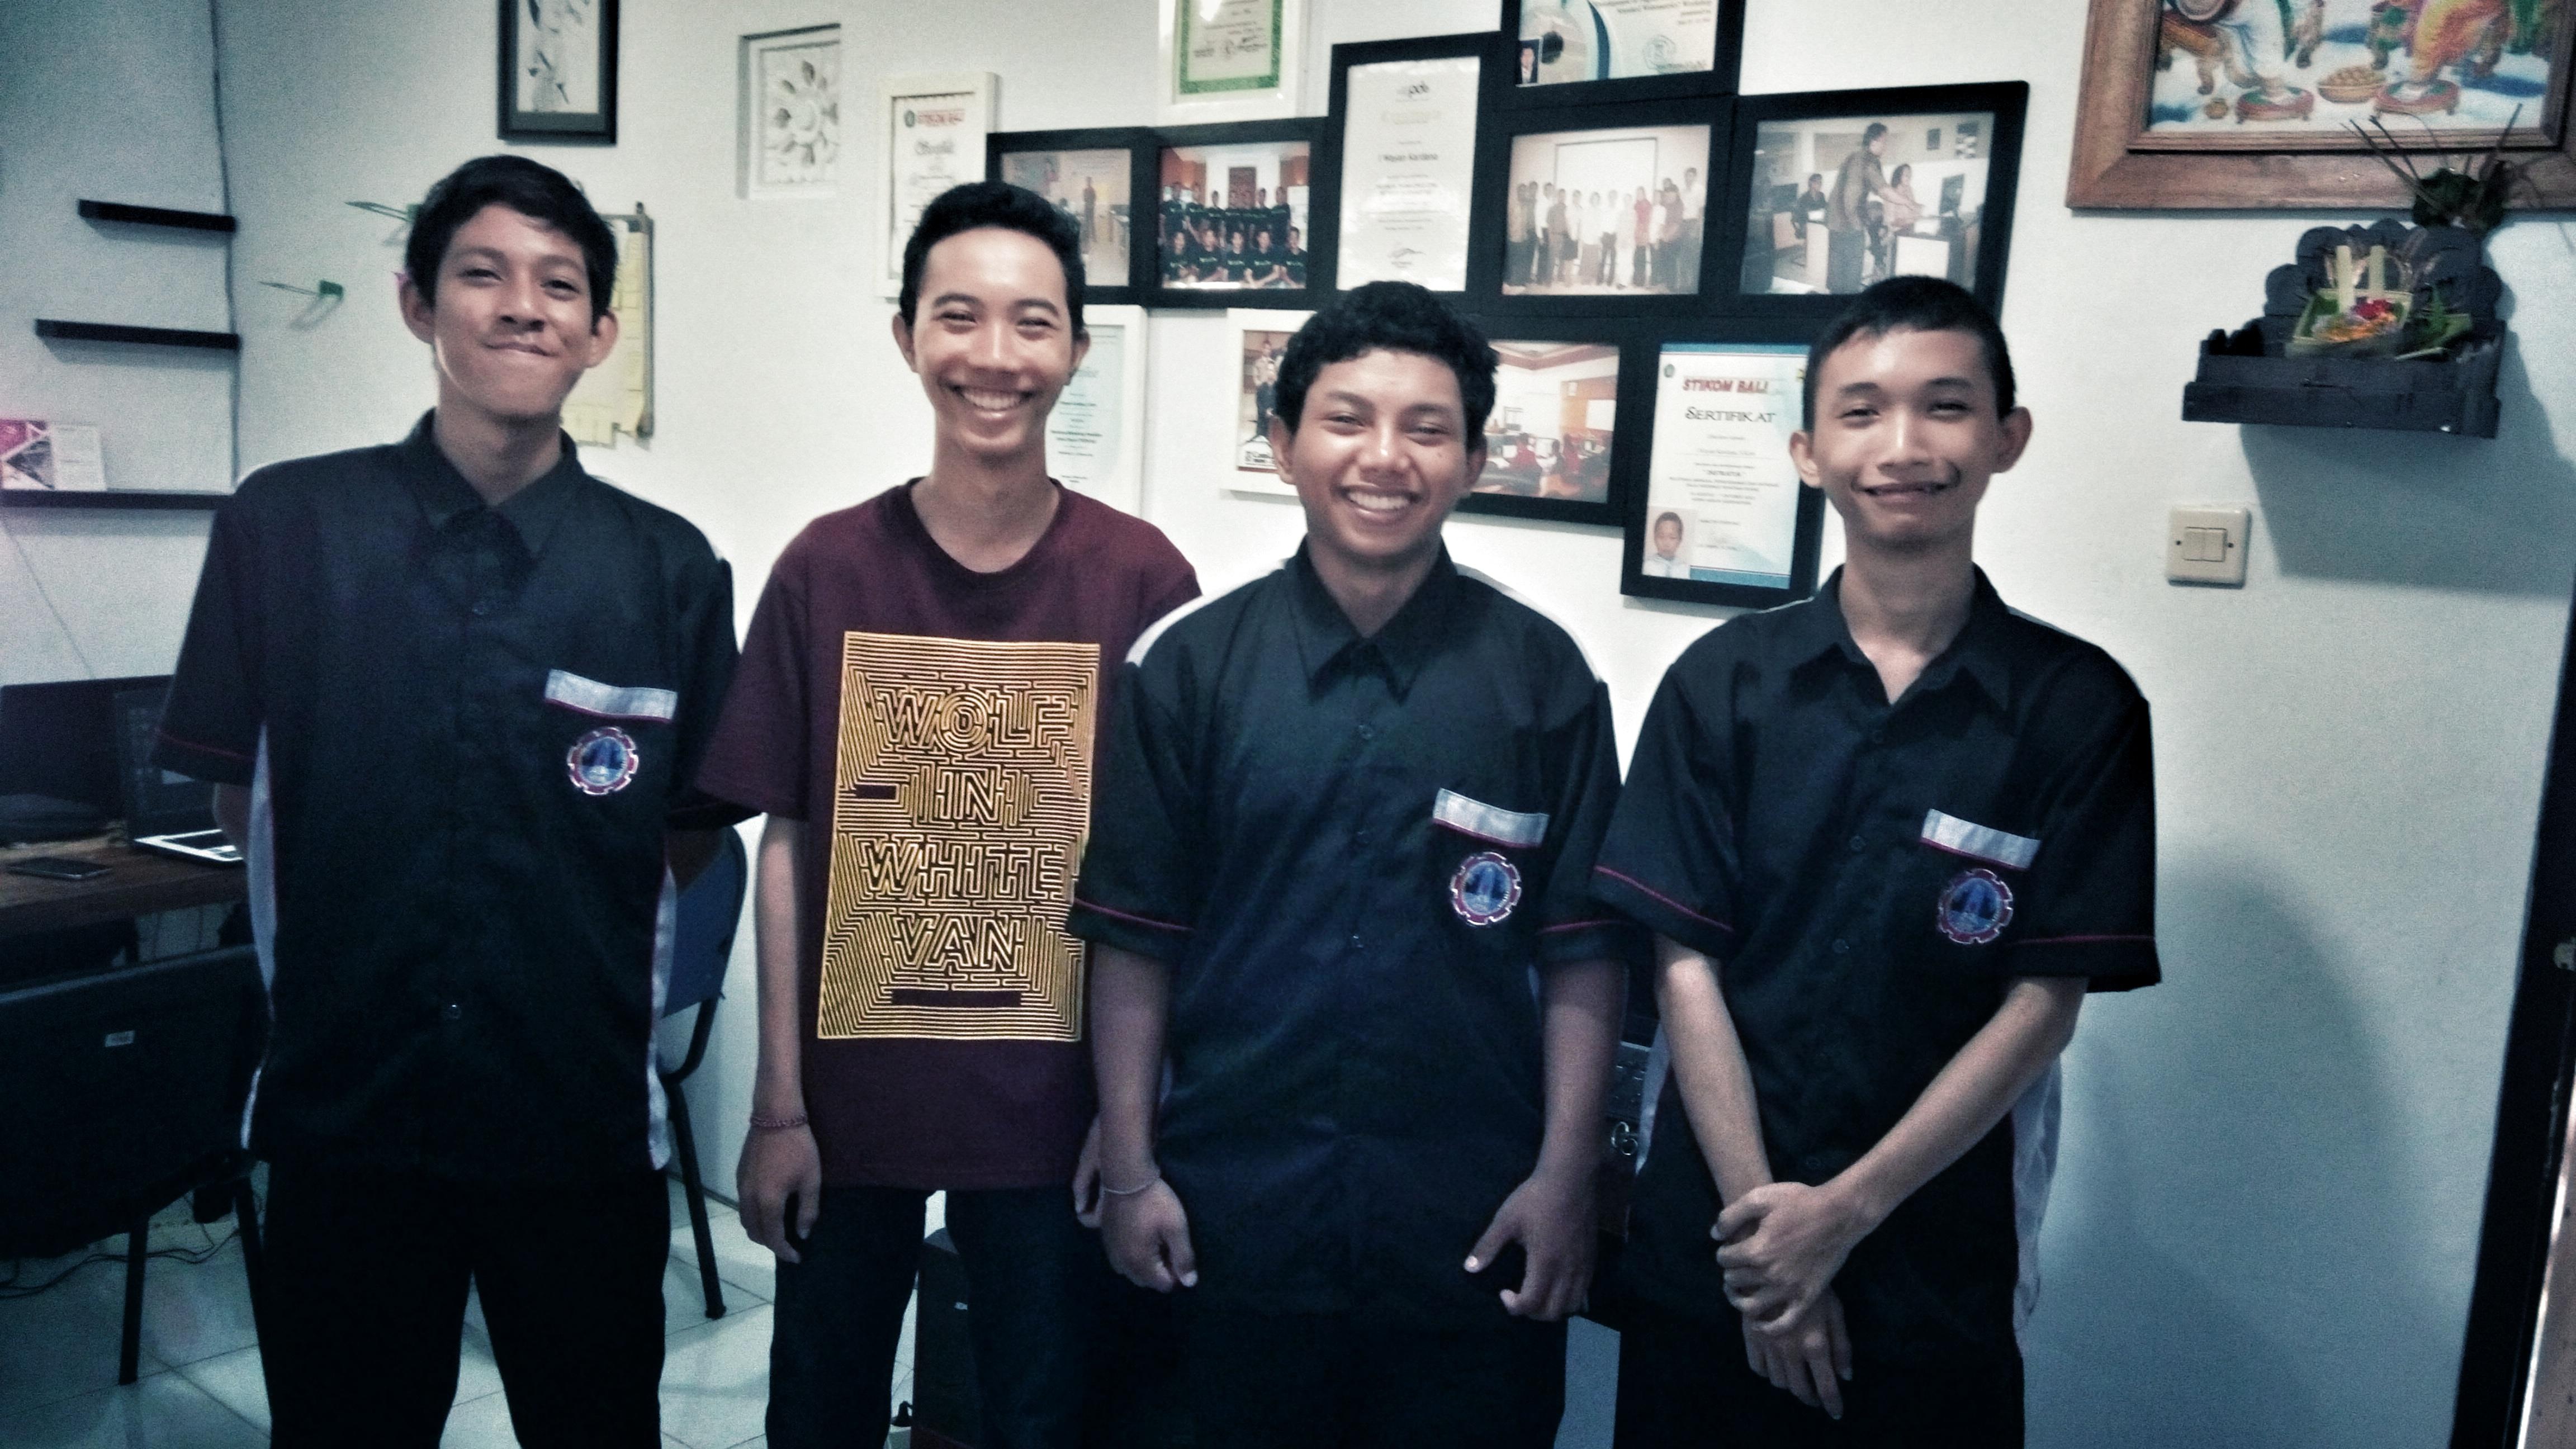 Selamat datang siswa praktek kerja industri SMKN 1 Mas Ubud